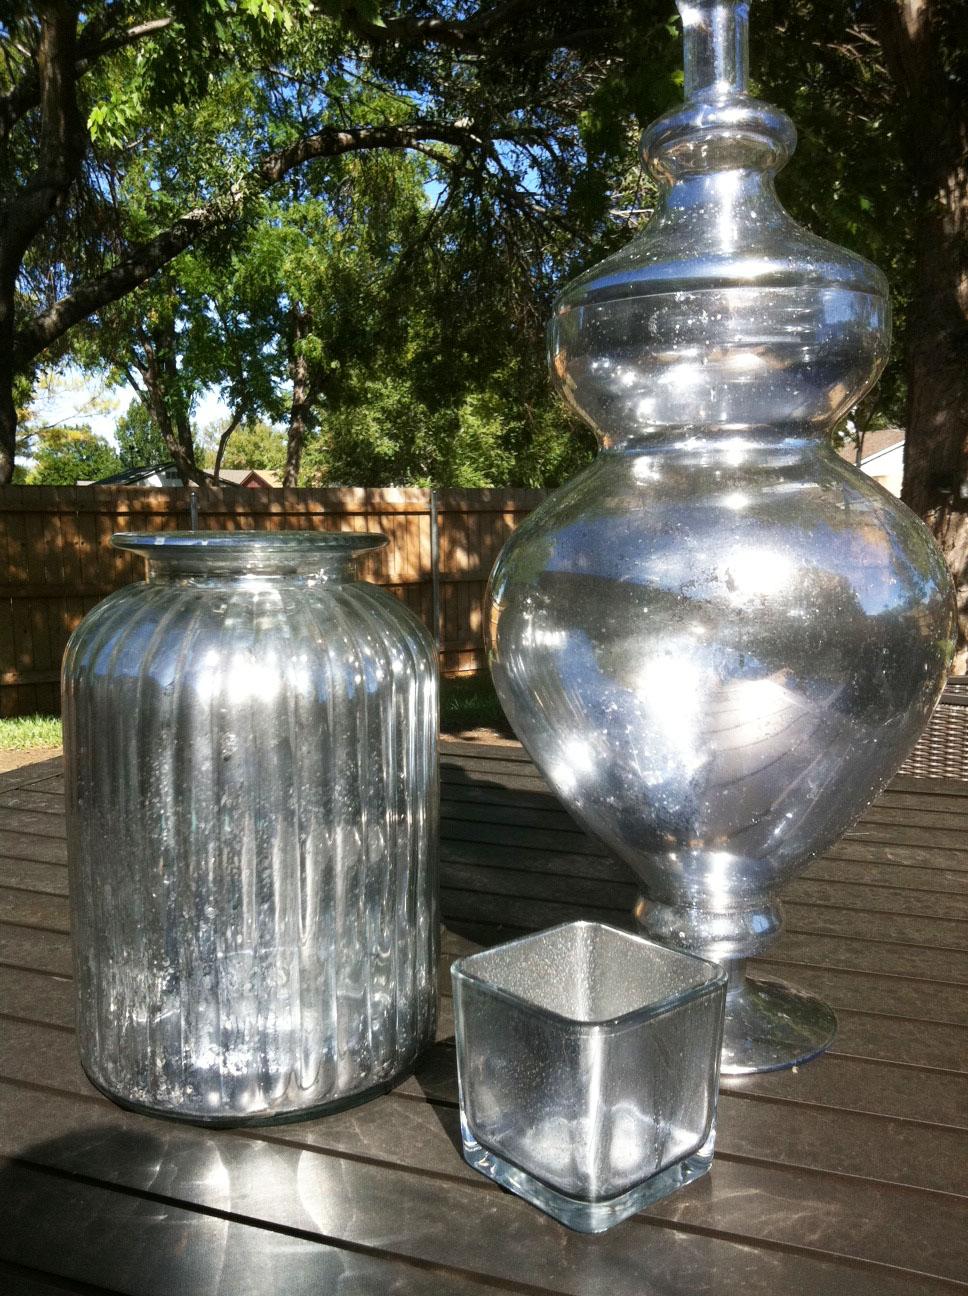 The happy homebodies diy mercury glass diy mercury glass reviewsmspy